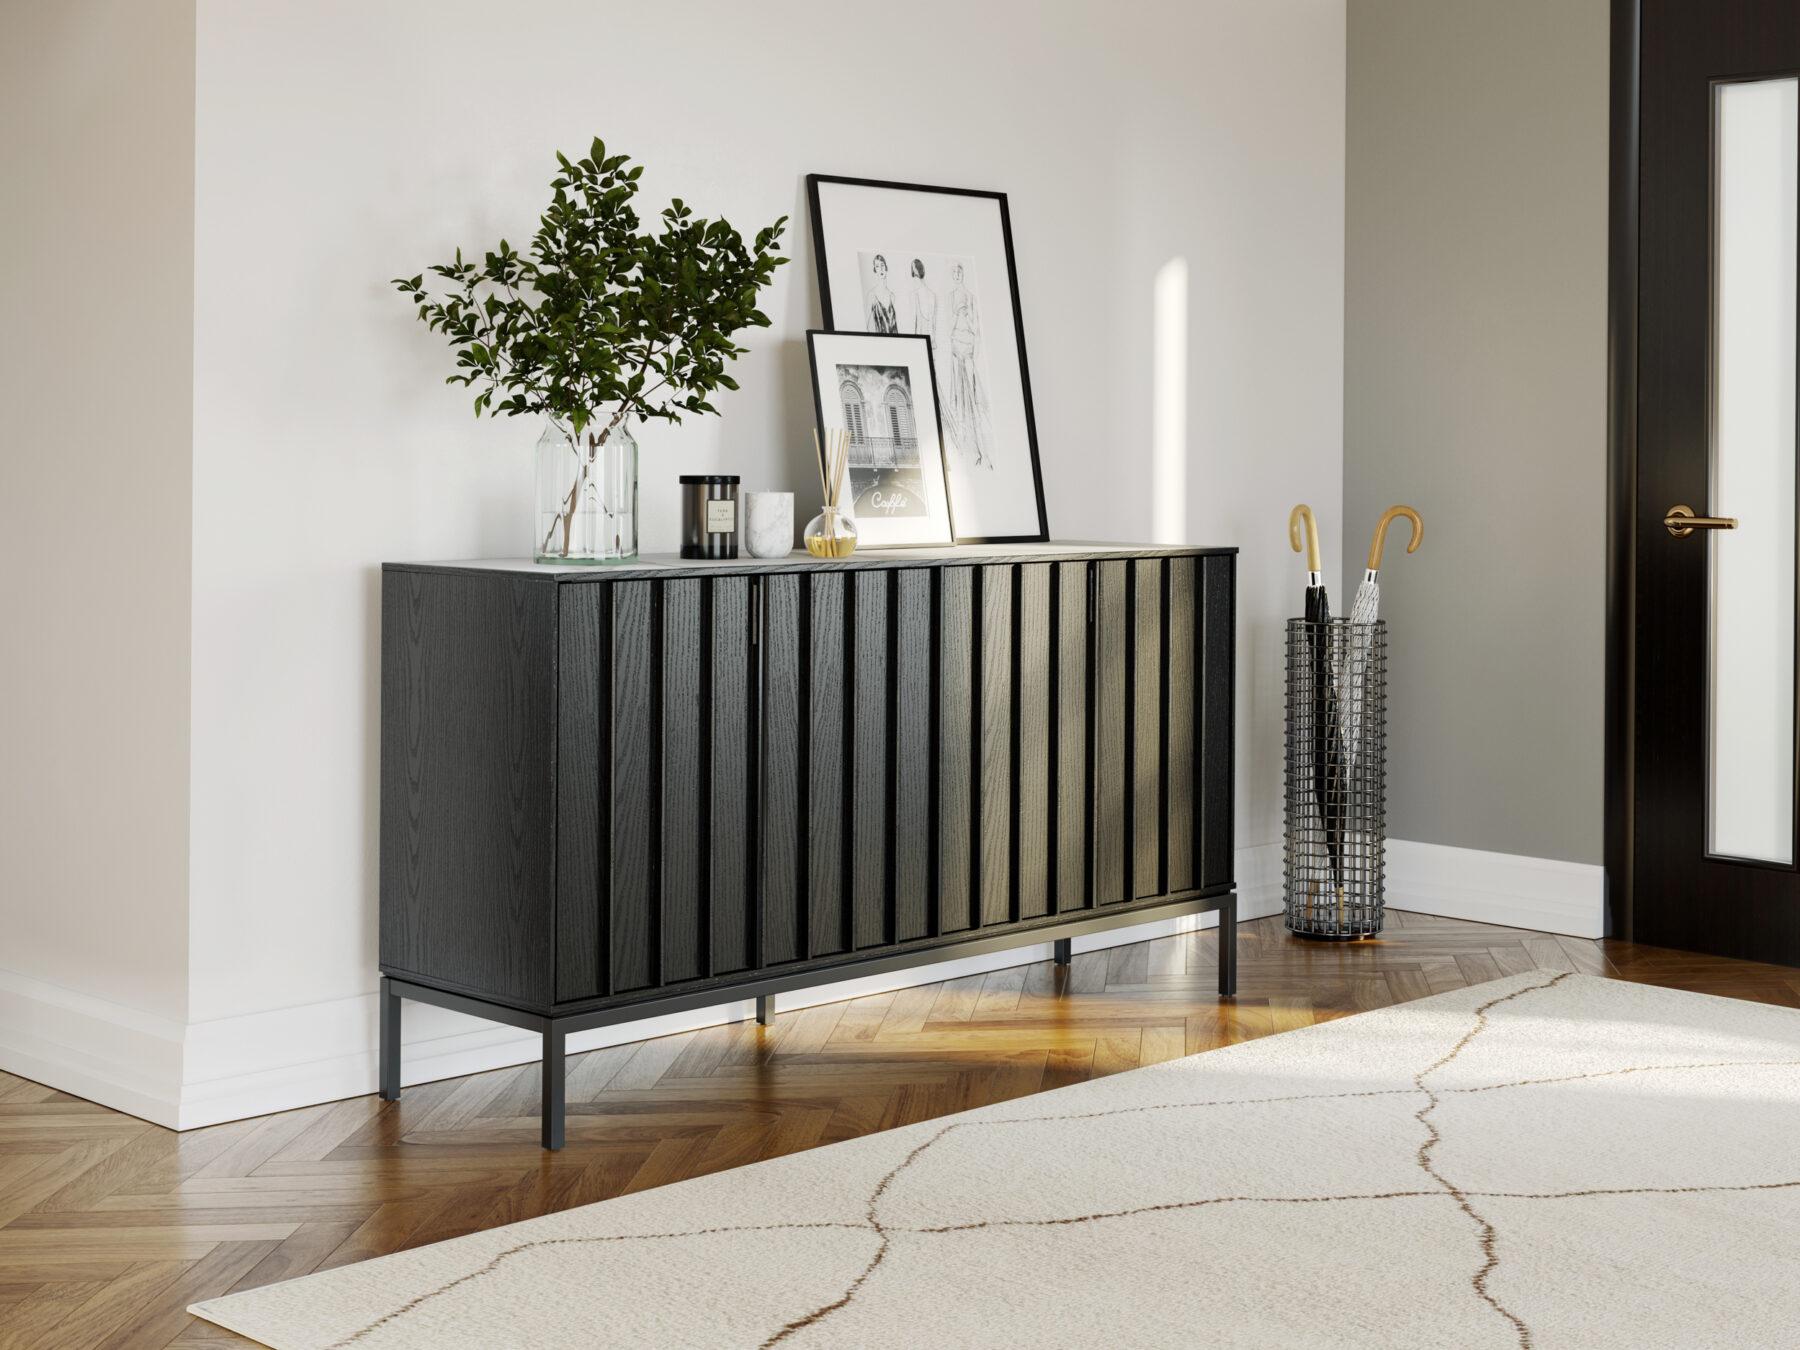 cosmo-5729-BDI-modern-storage-cabinet-EBO-LS1a